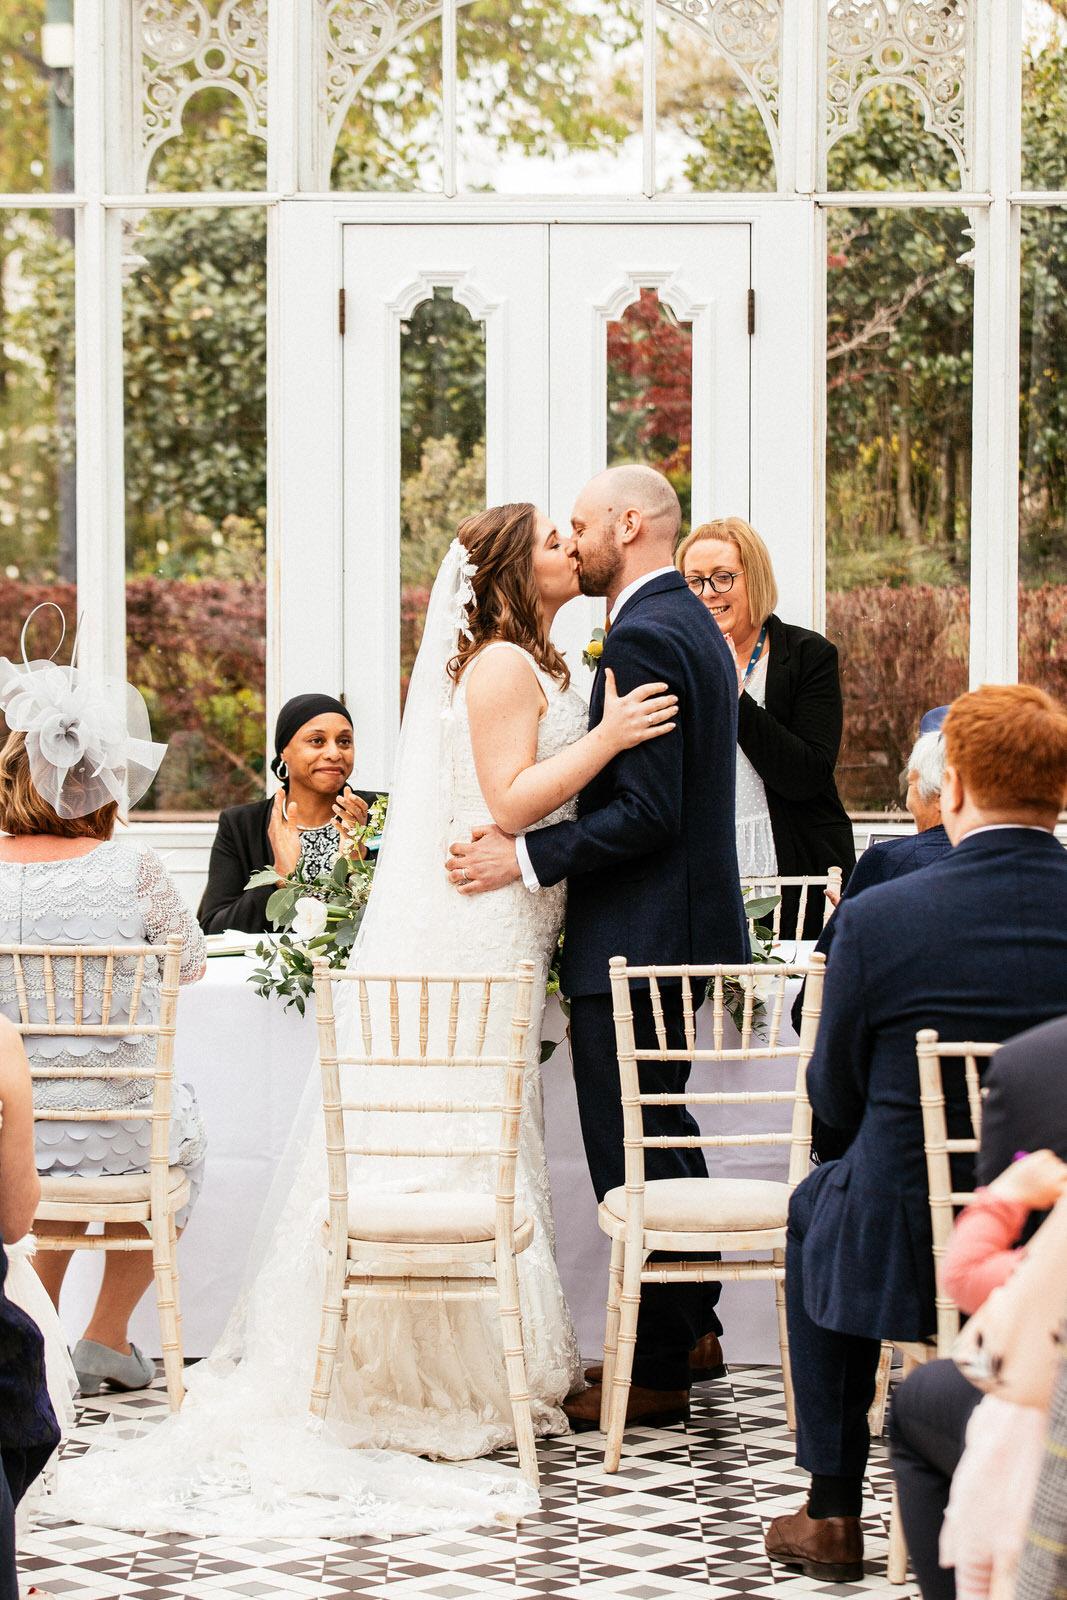 Jenni-and-James-Wedding-Highlights-17.jpg